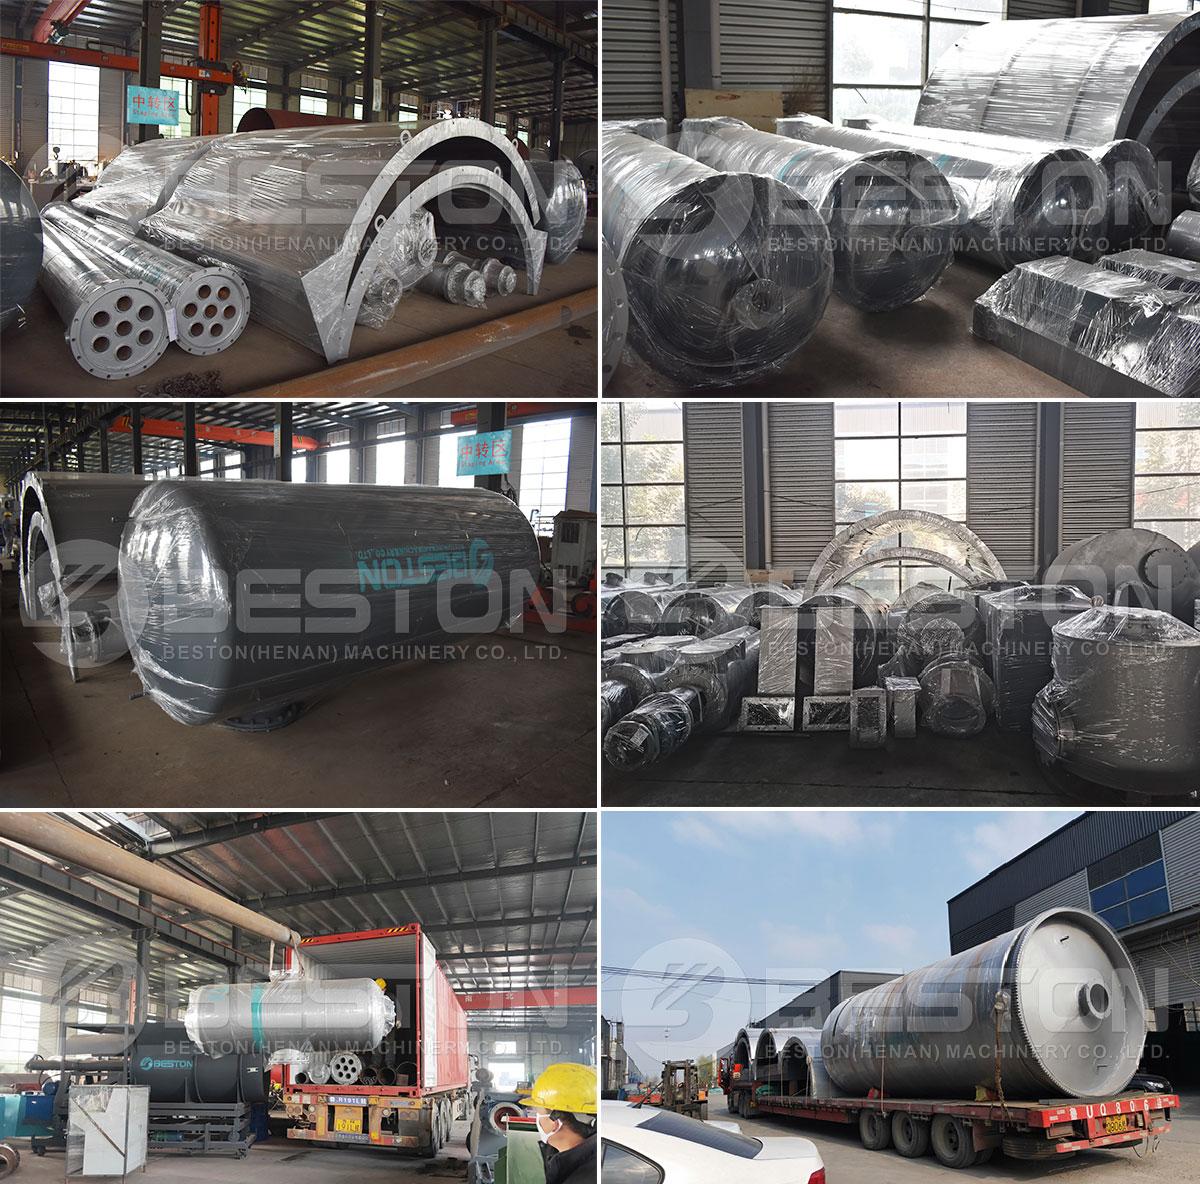 BLJ-16 Beston Waste Pyrolysis Equipment Shipped to Egypt